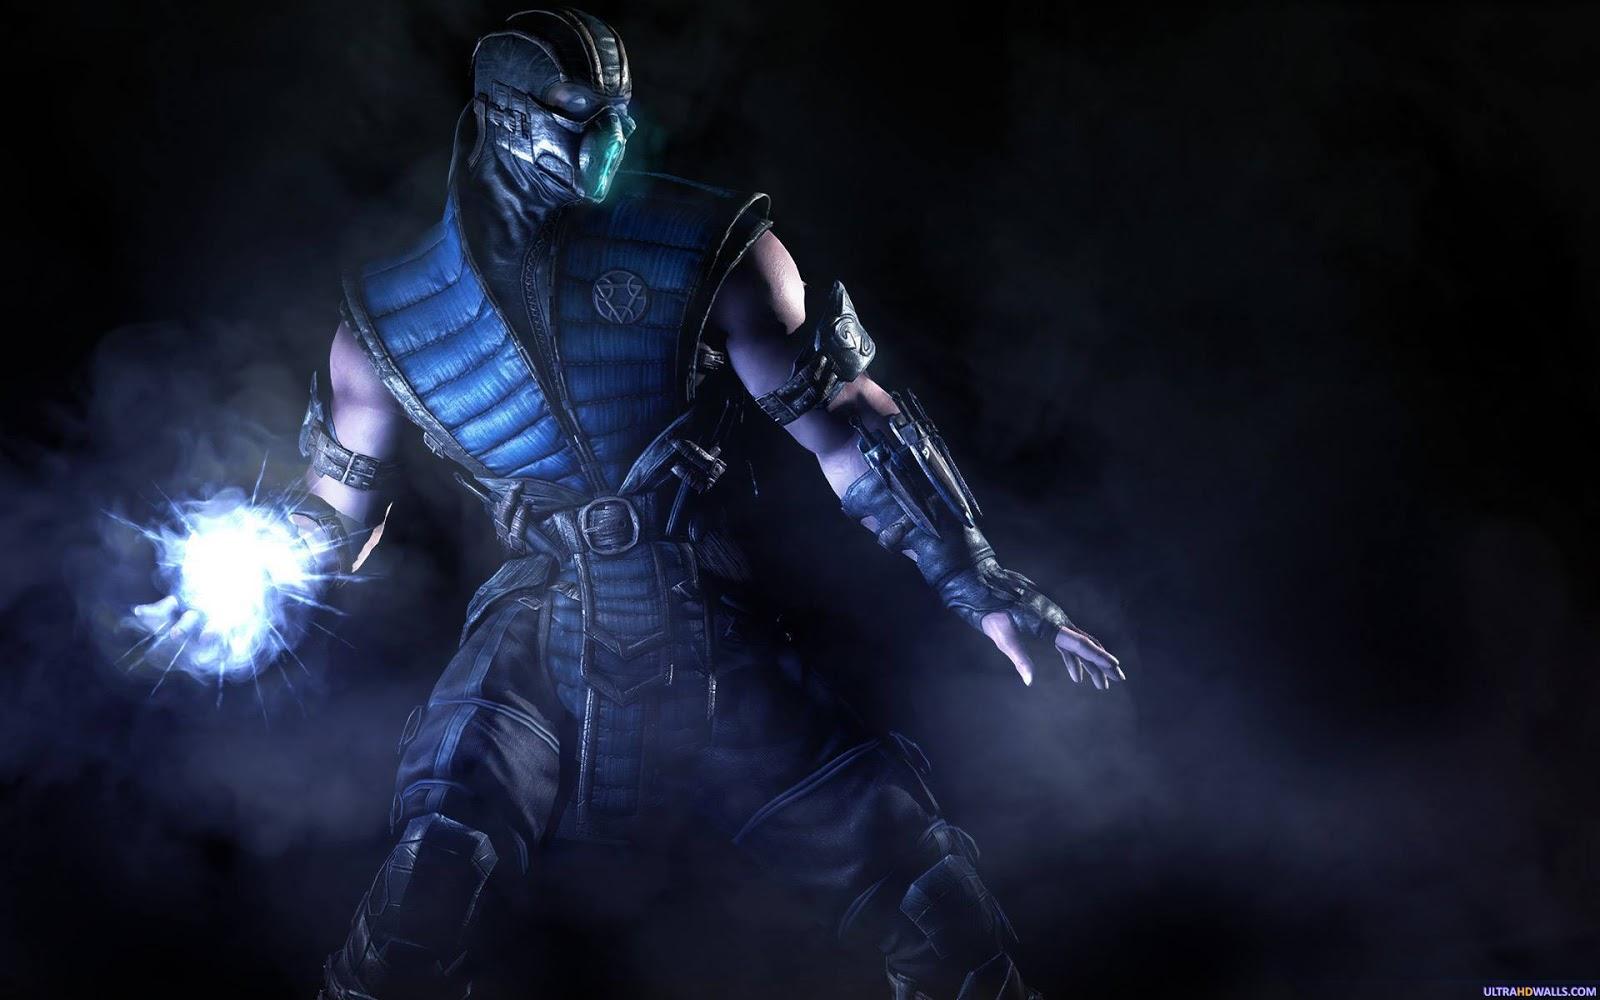 Mortal Kombat X Wallpapers: Mortal Kombat X Game Wallpapers